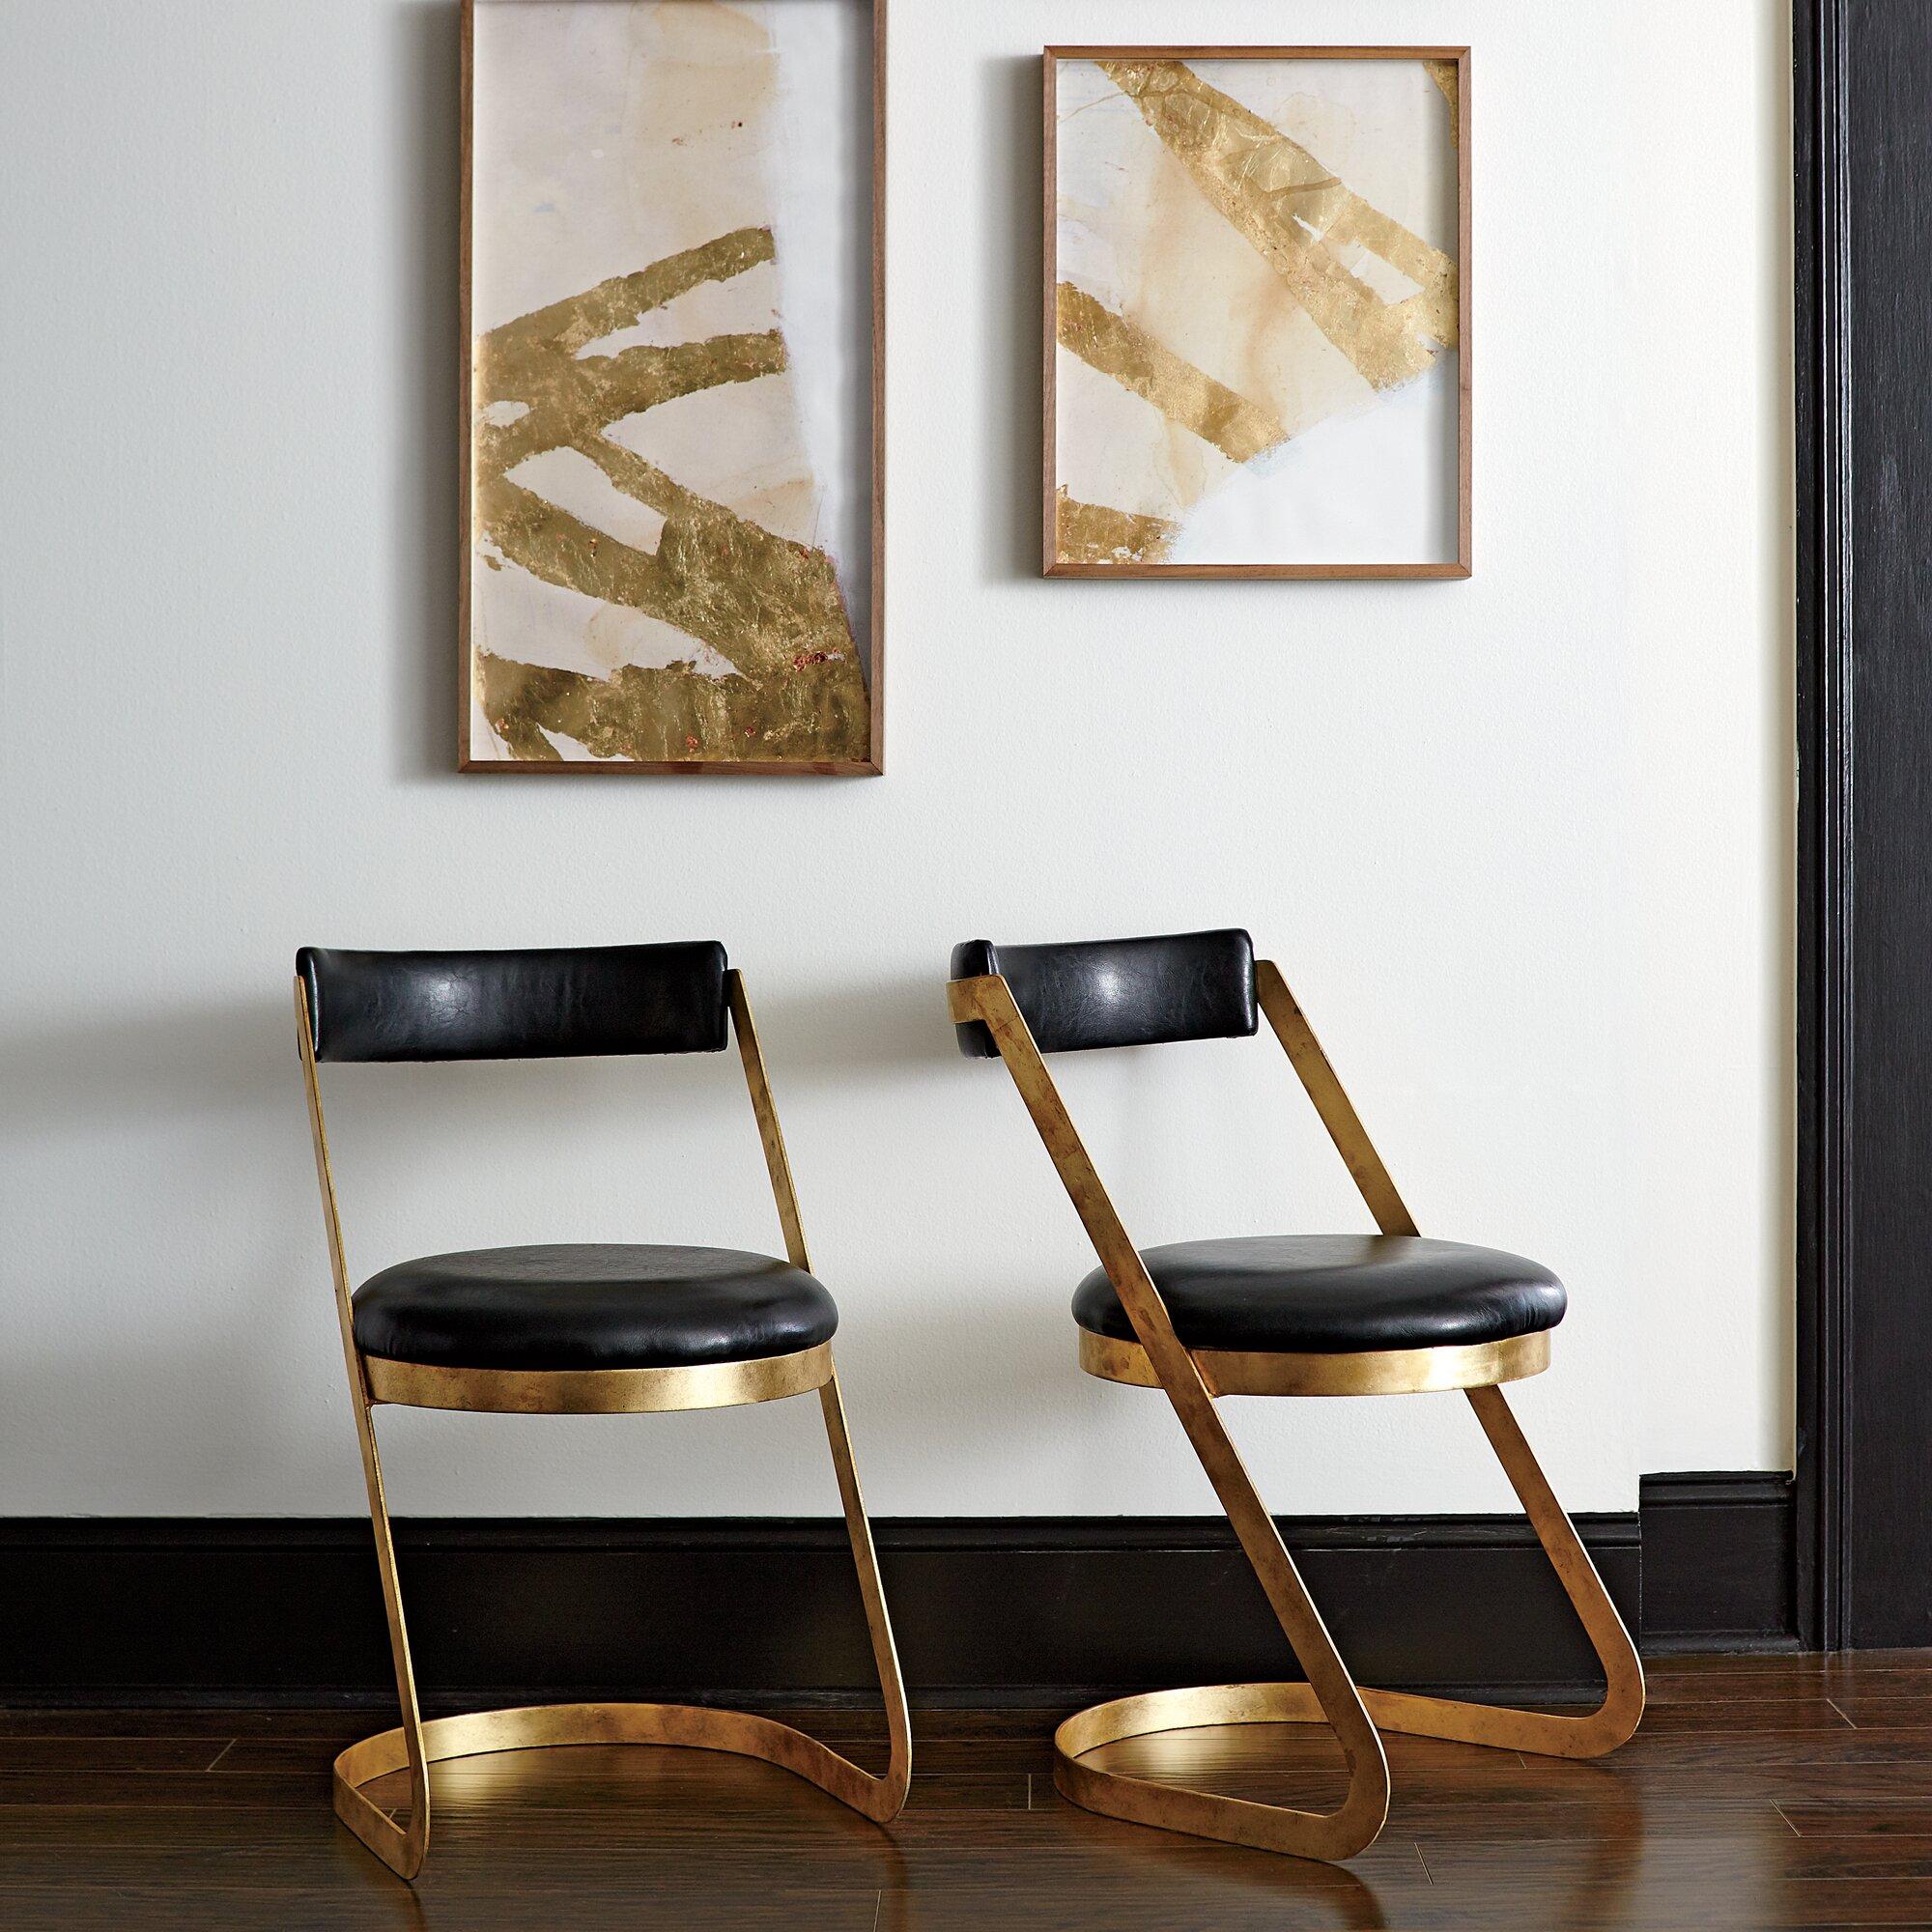 dwellstudio farrah dining chair reviews dwellstudio